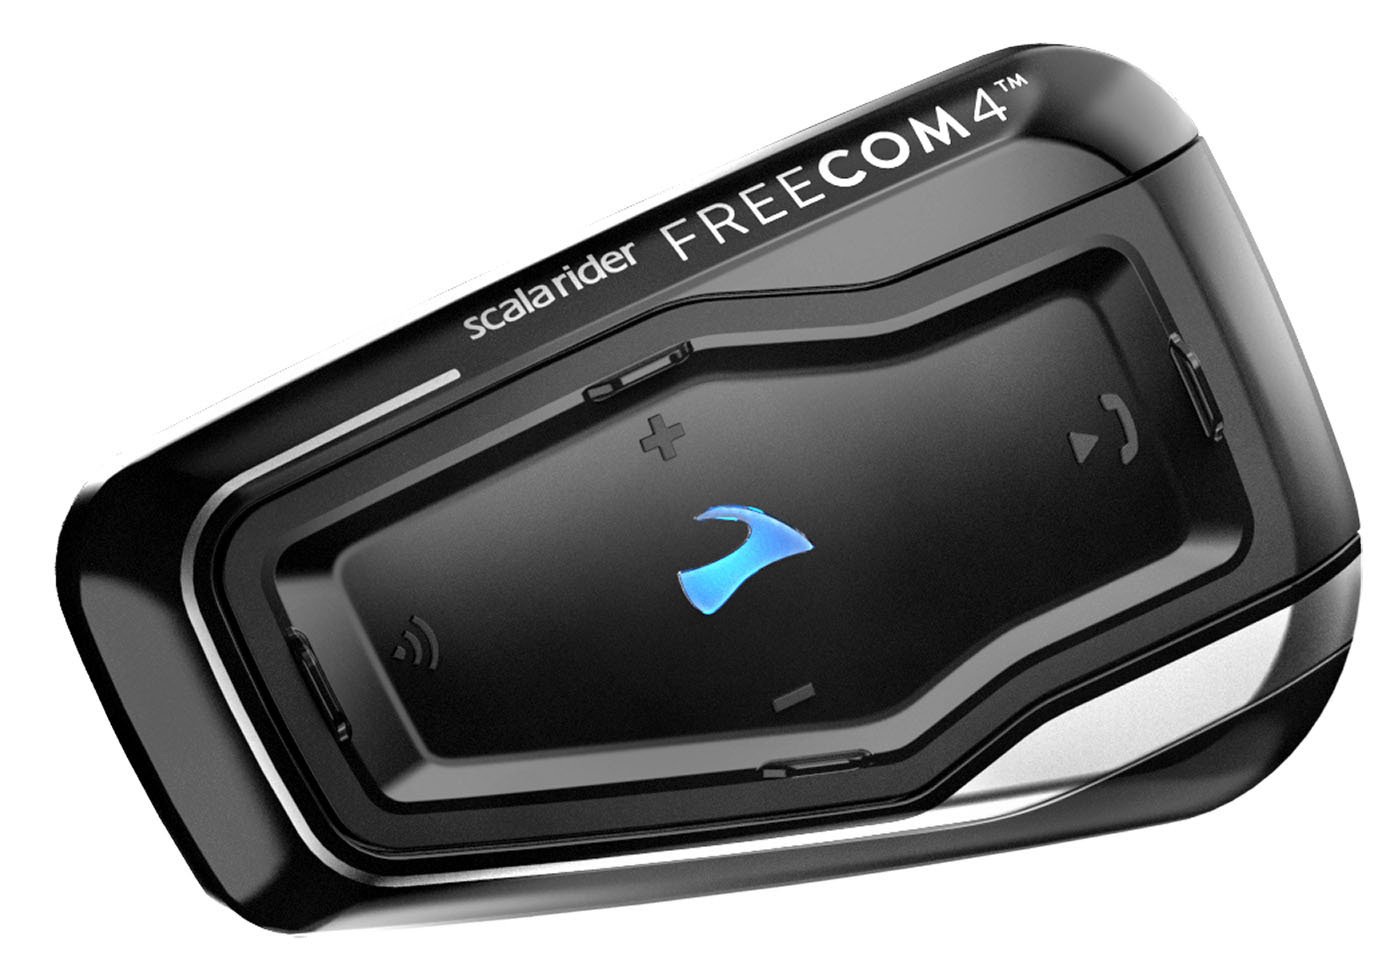 Cardo Scala Rider Freecom 4 Kommunikationssystem Einzelpack, schwarz, schwarz